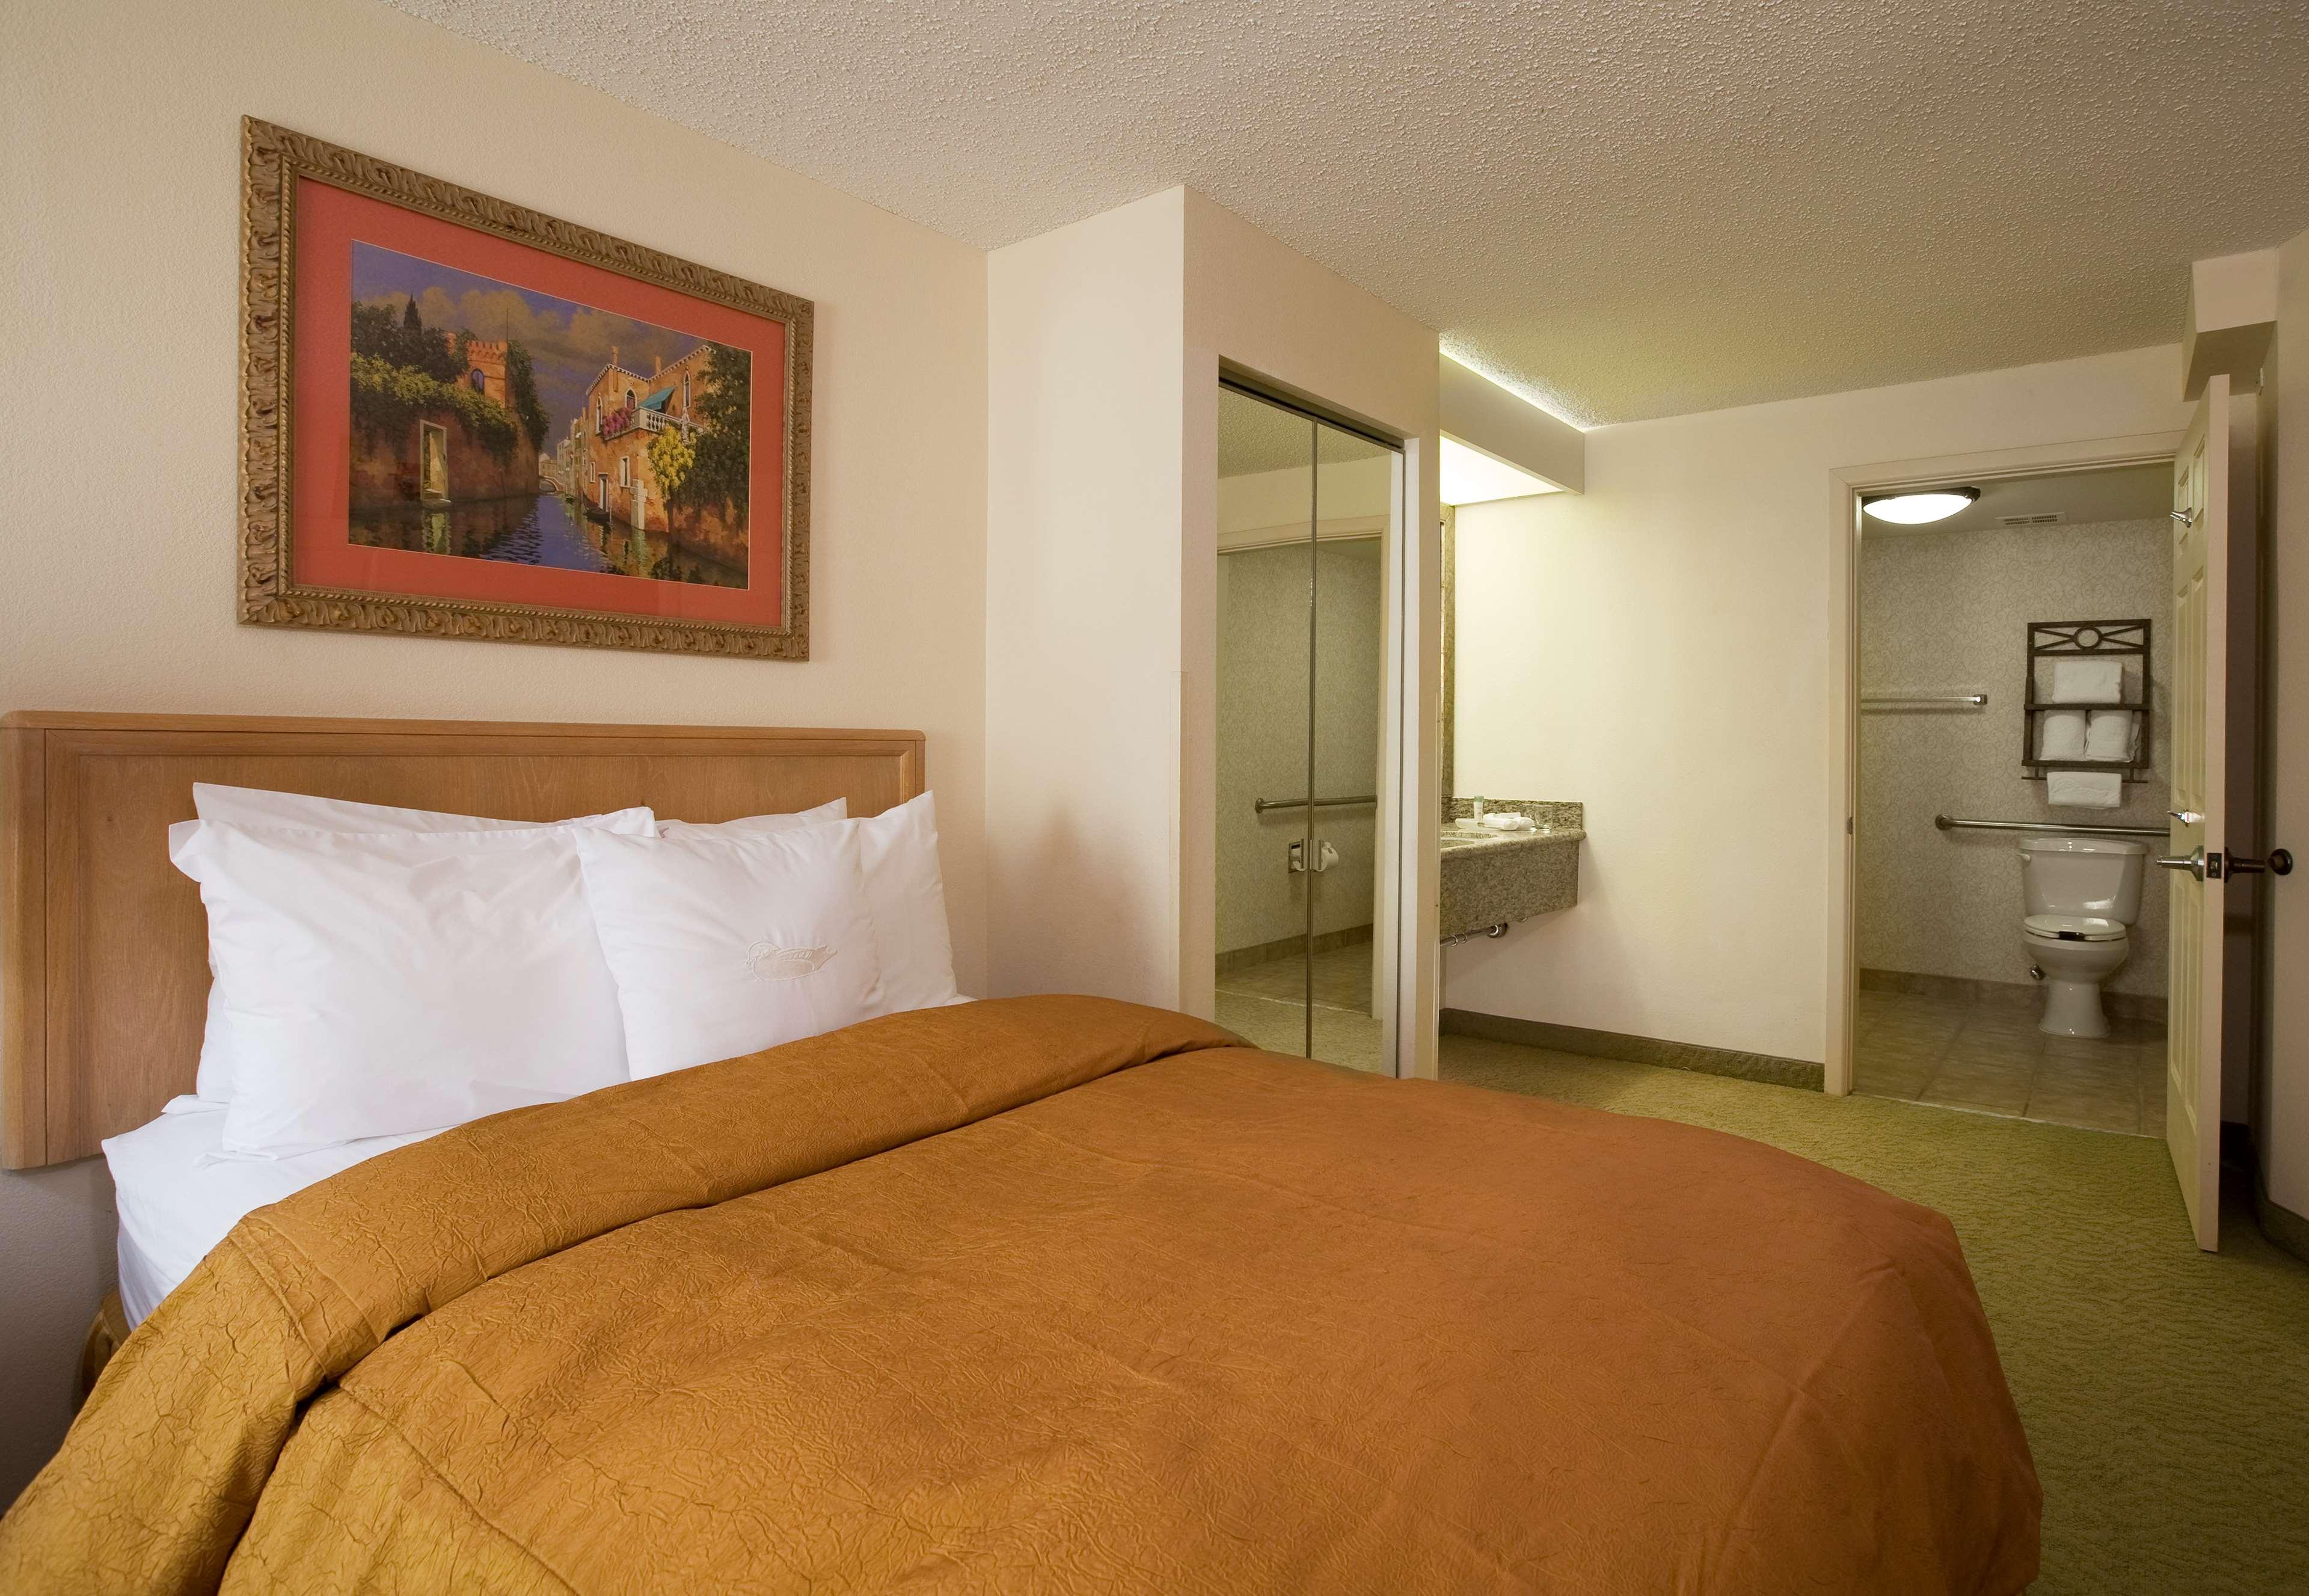 Homewood Suites by Hilton Austin-South/Airport image 6